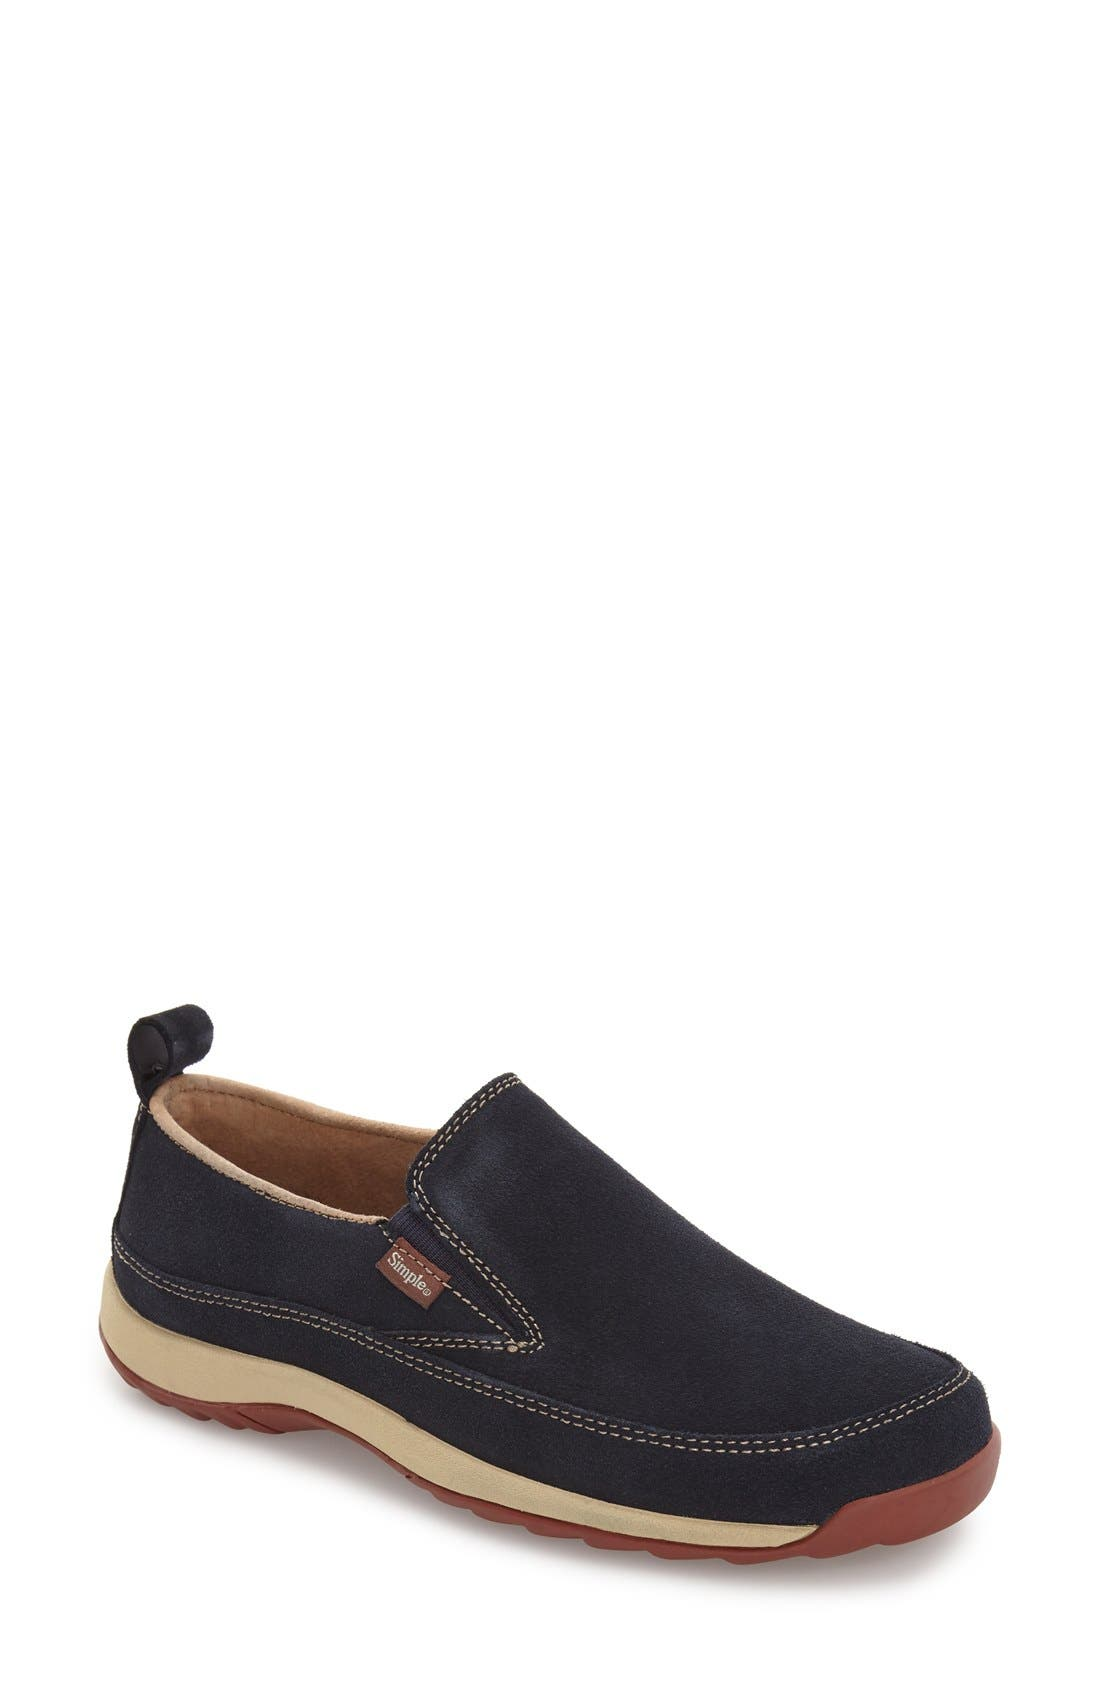 SIMPLE Spice Slip-On Sneaker